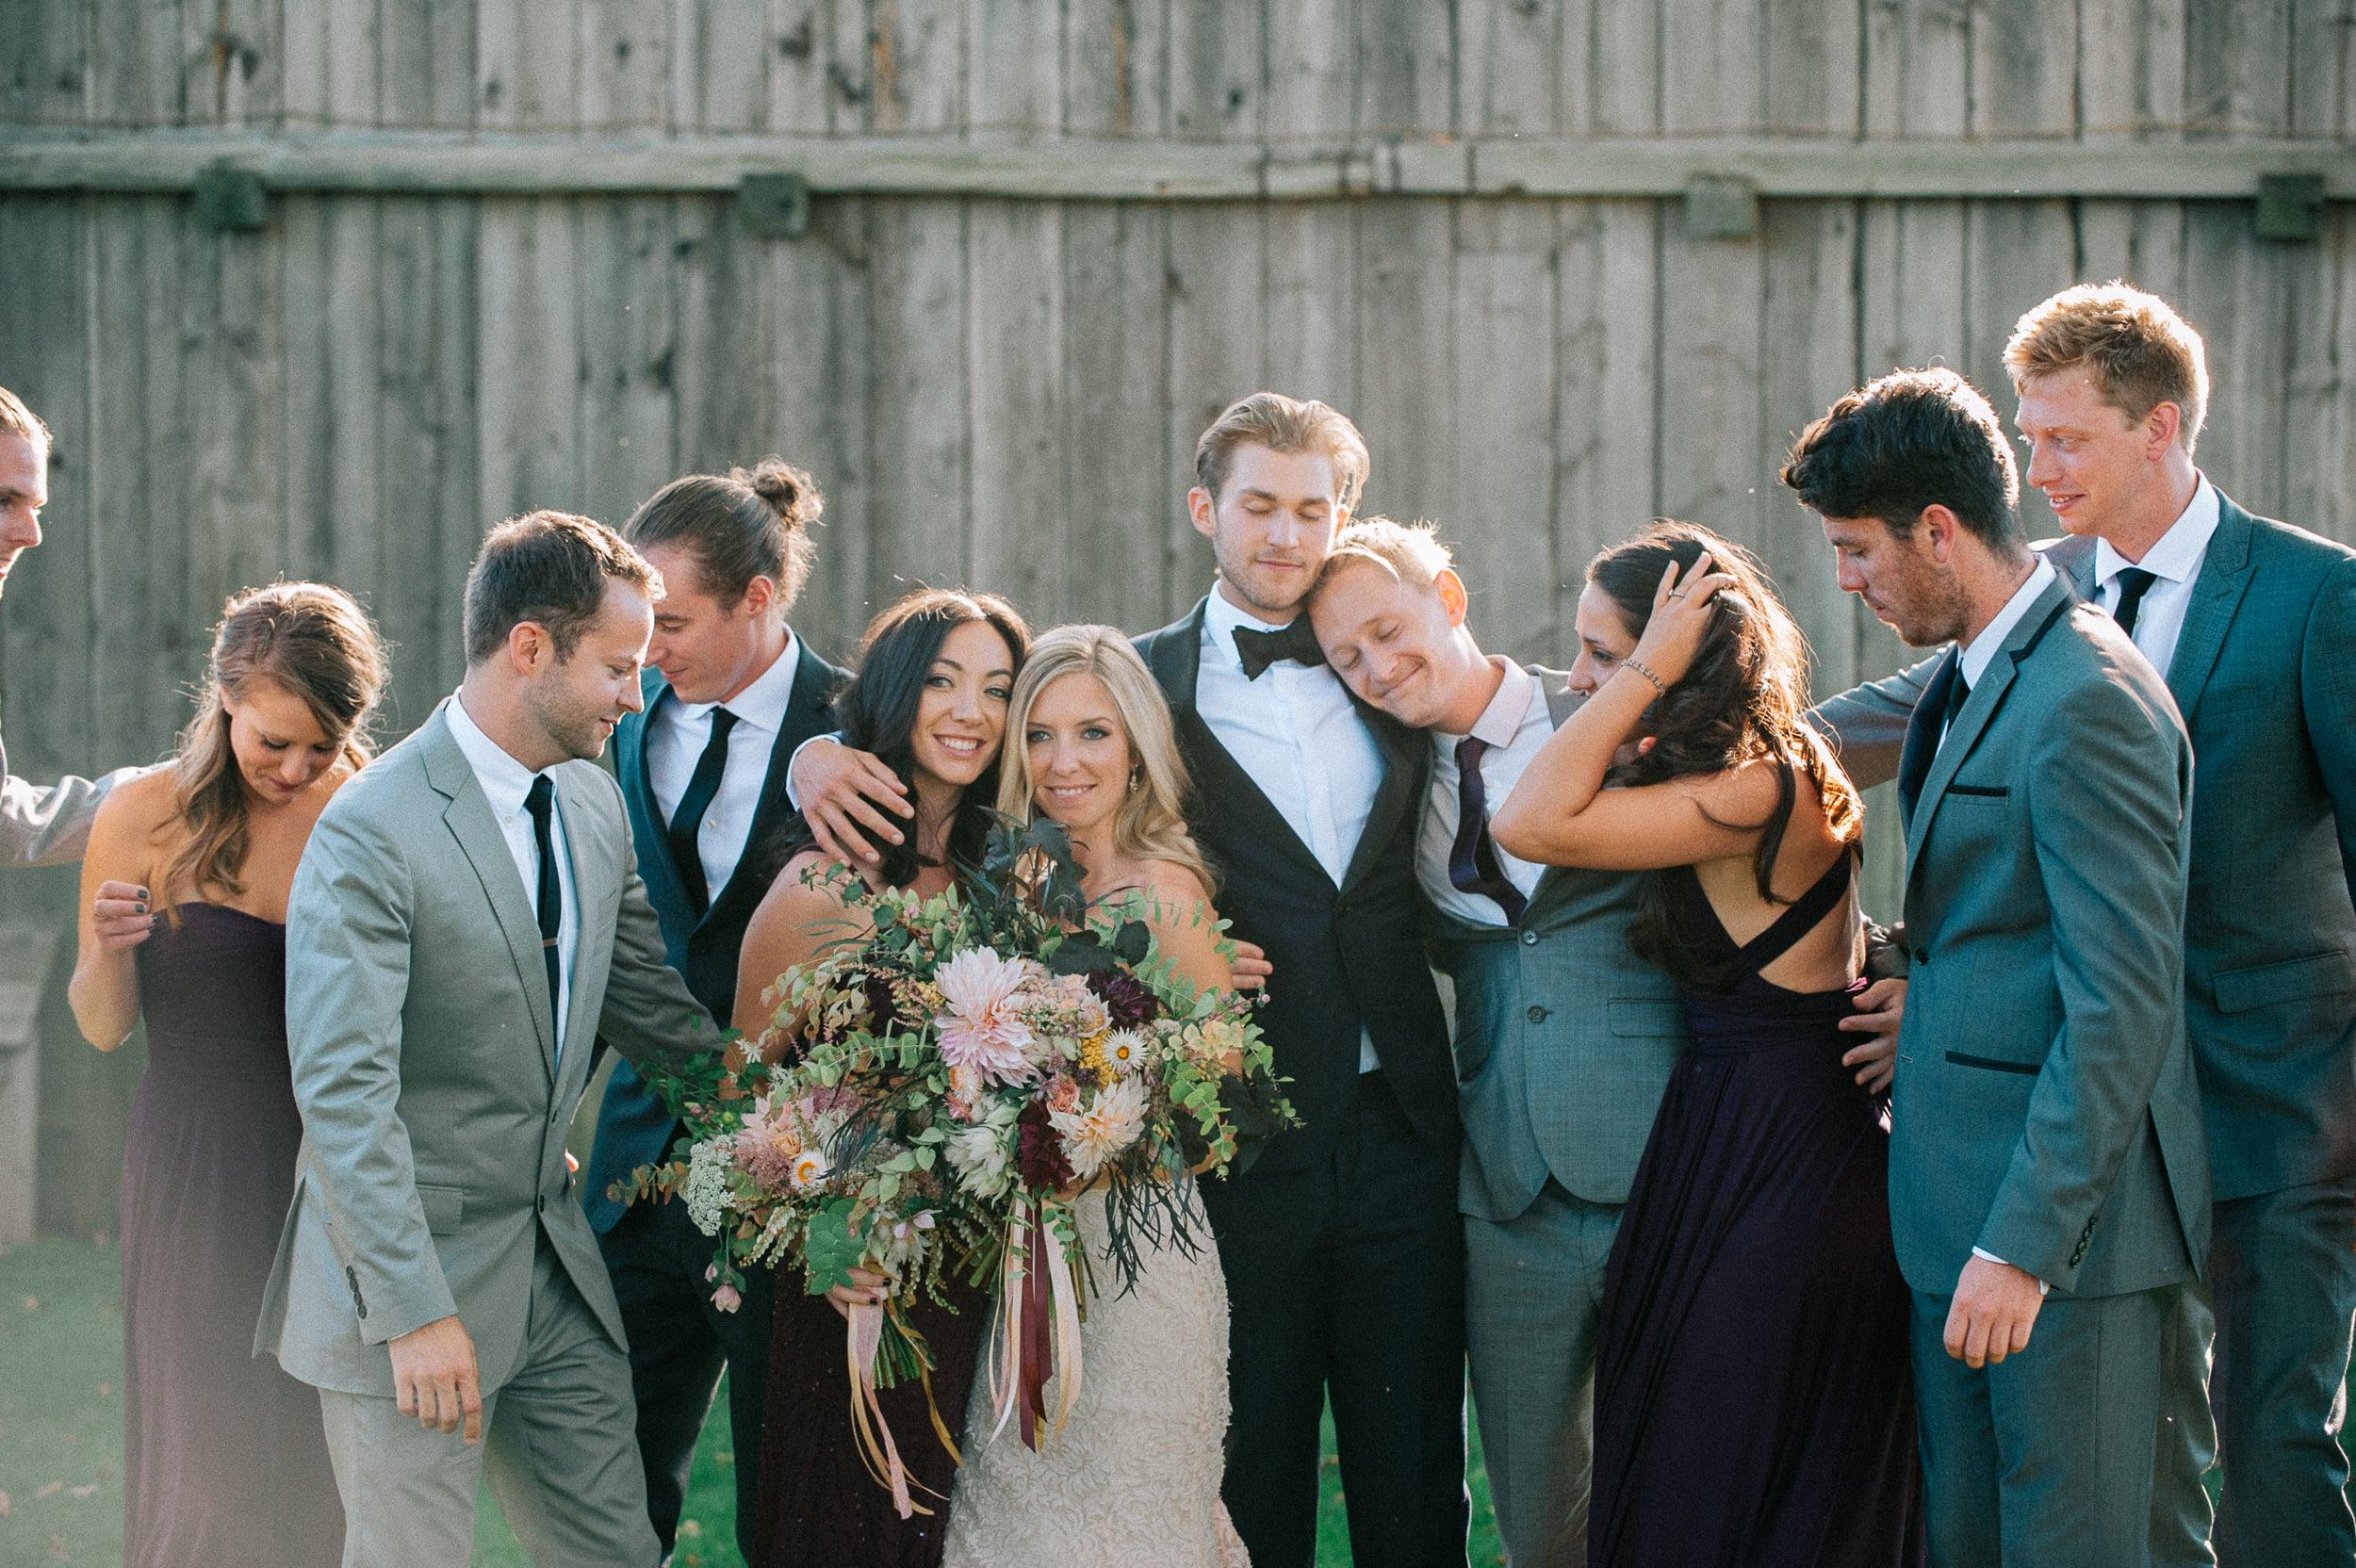 terrain-anthropologie-wedding-inspiration